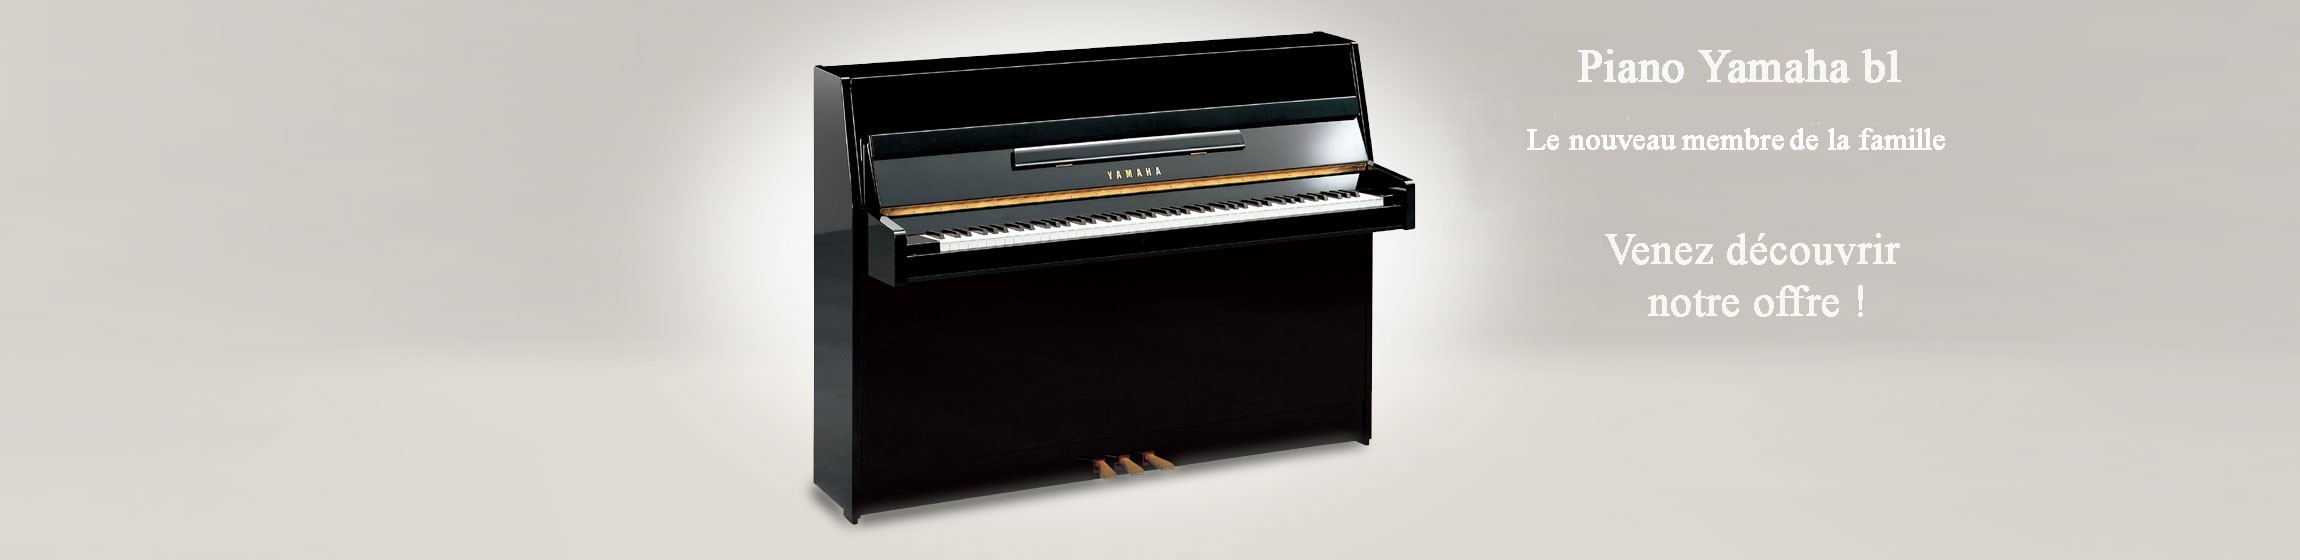 PIANO YAMAHA B1